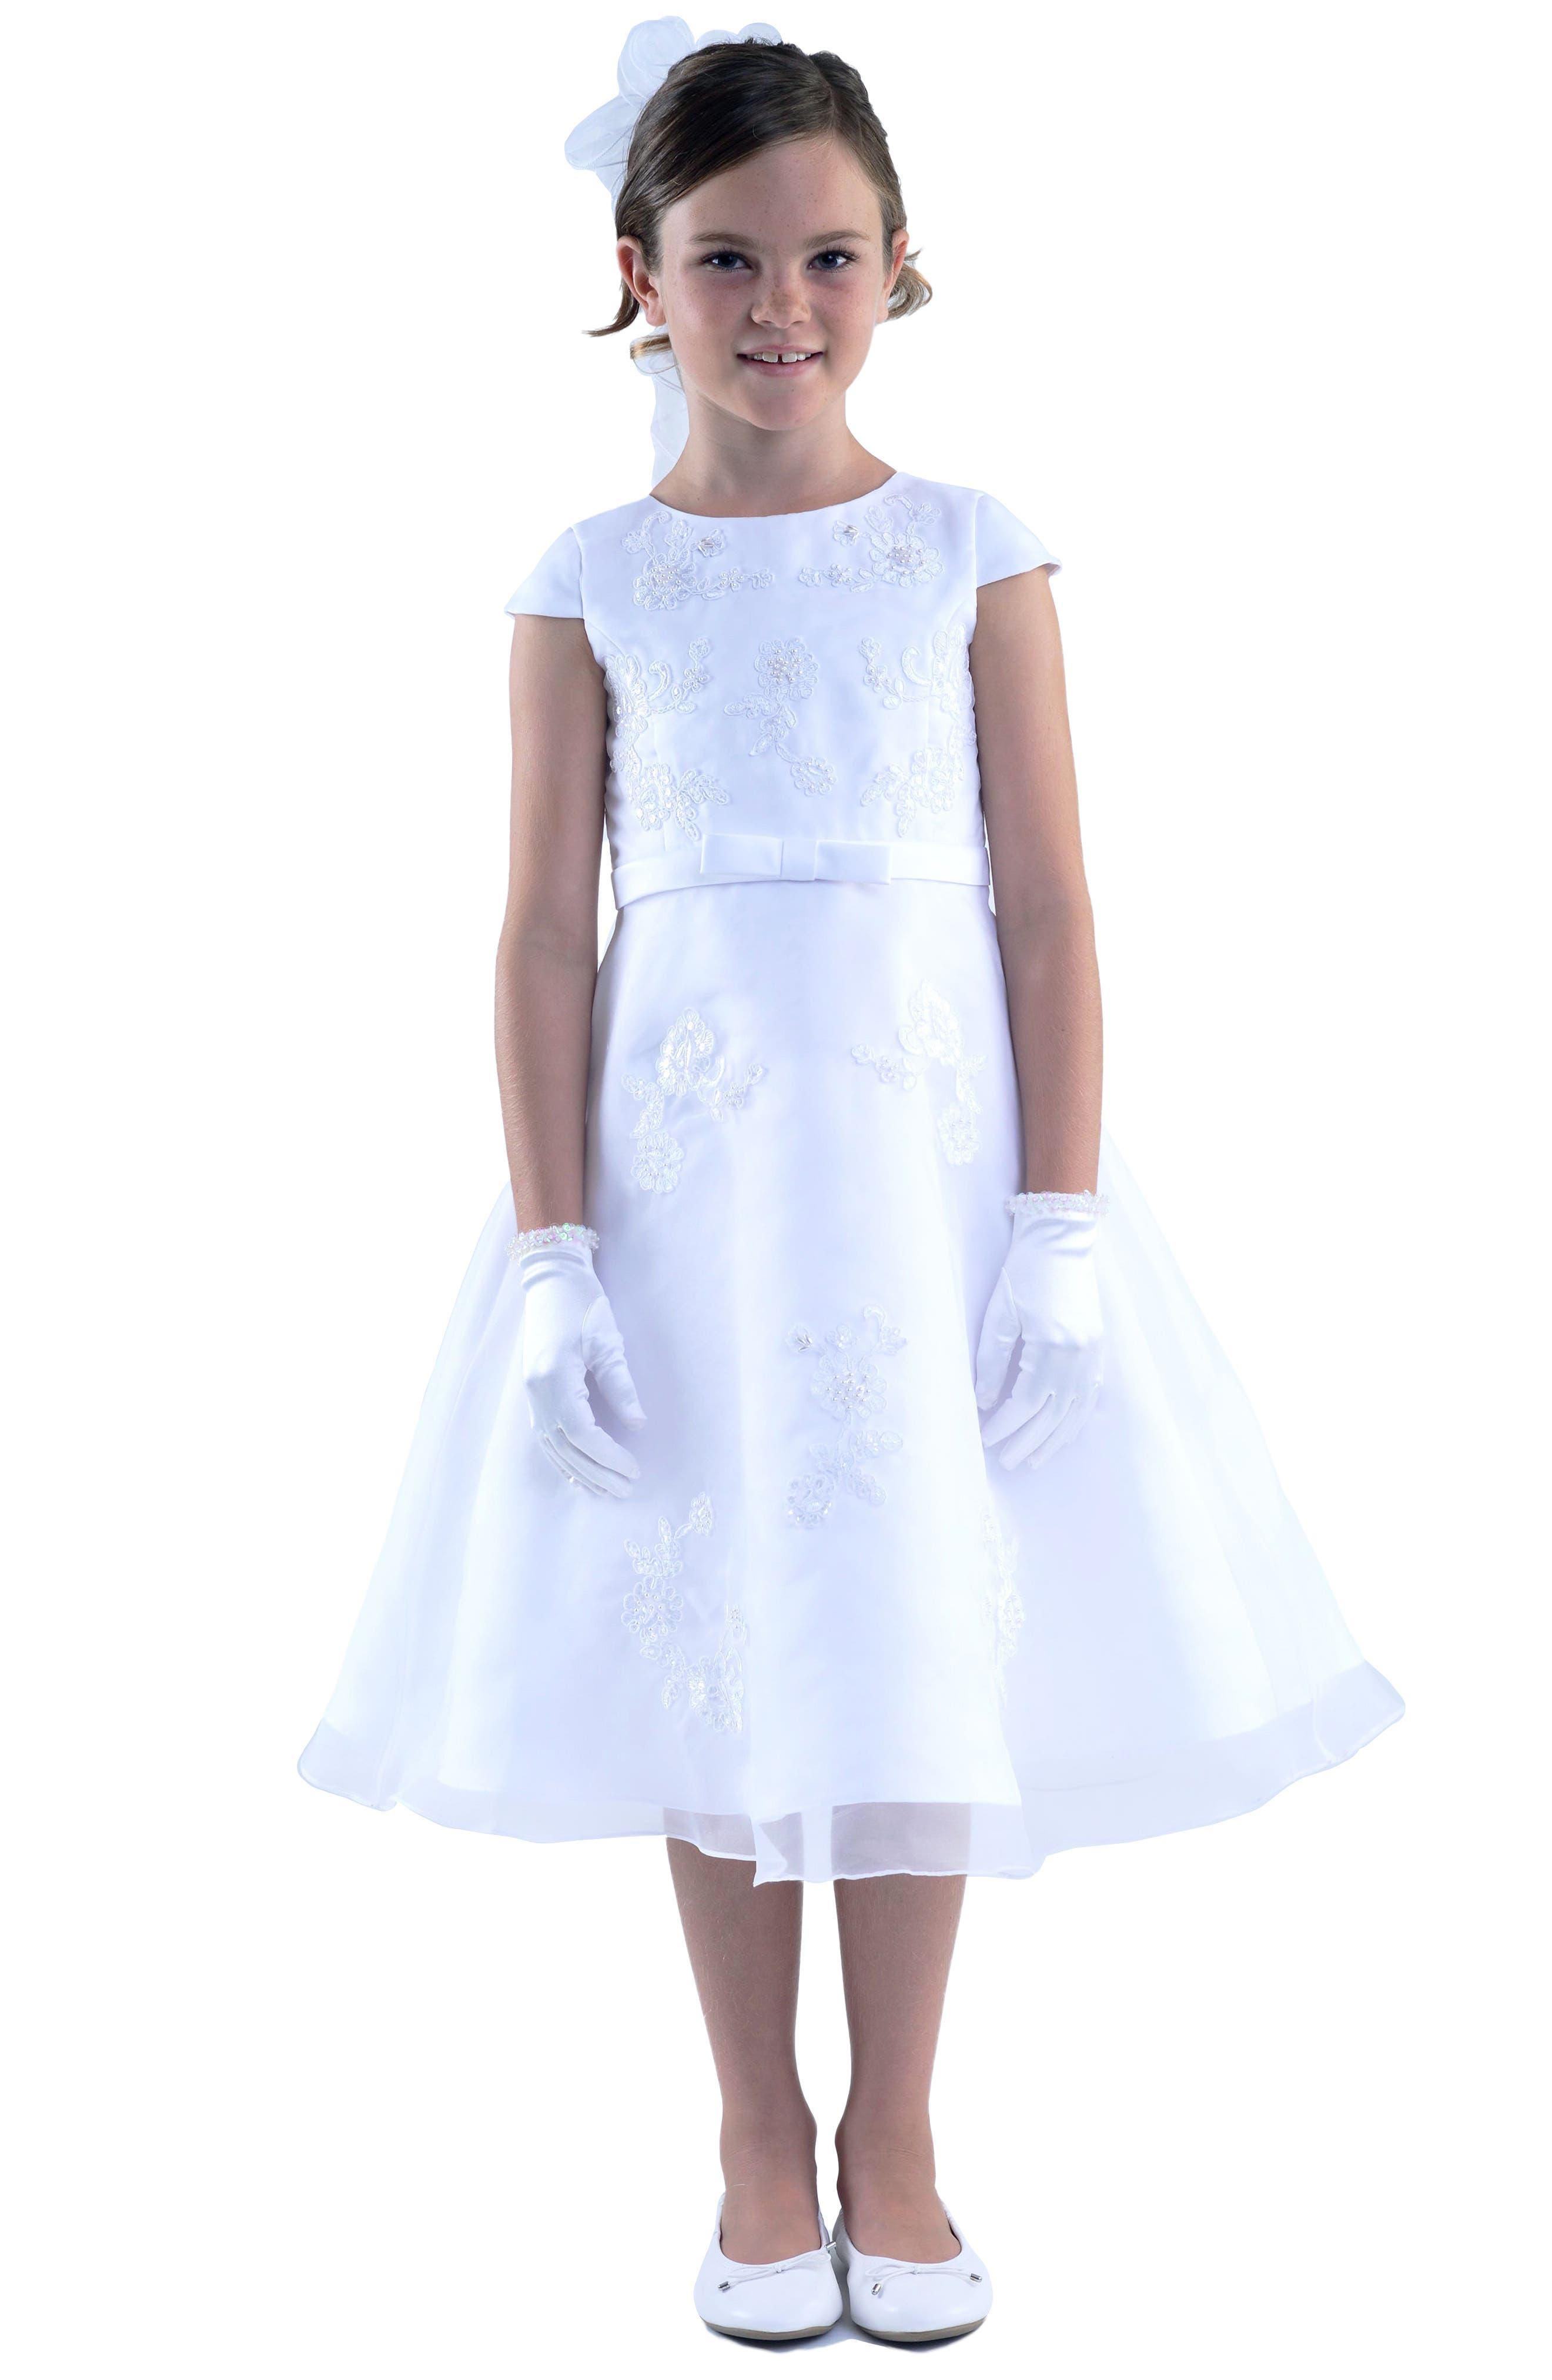 Us Angels Embroidered A-Line Dress (Big Girls)